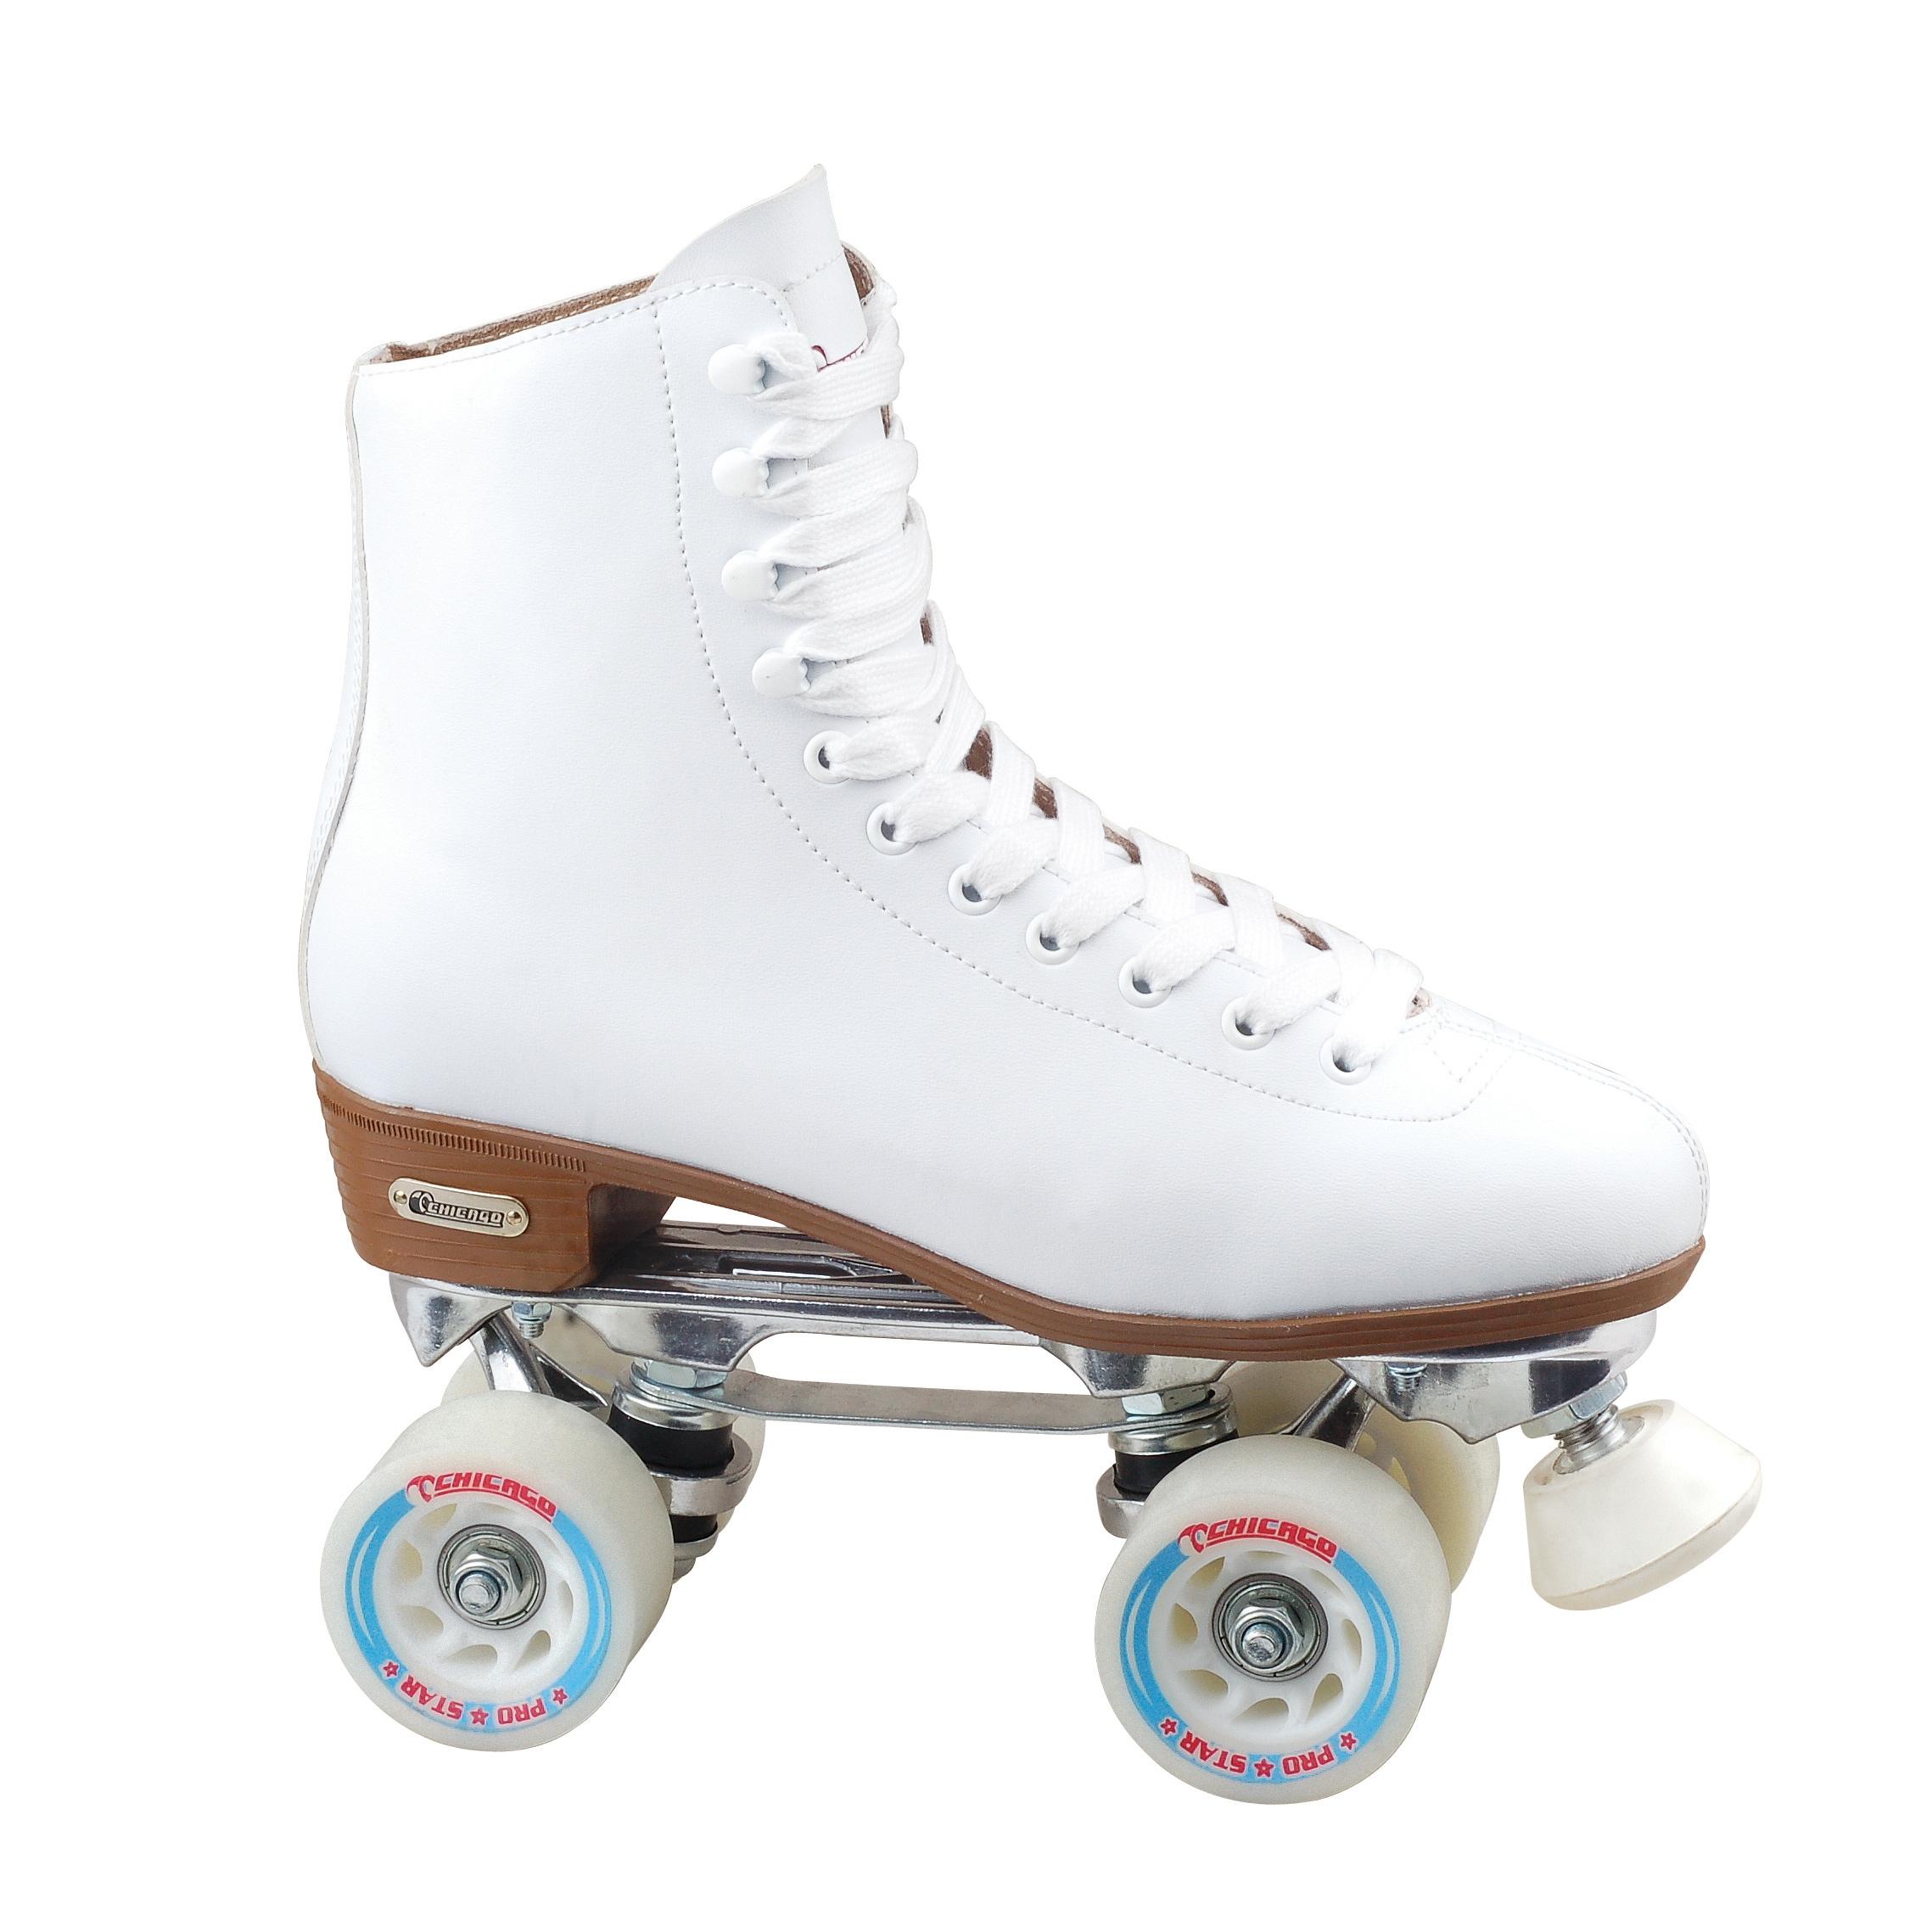 Chicago Skates Women's Deluxe Lined Rink Skate (Size 10),...